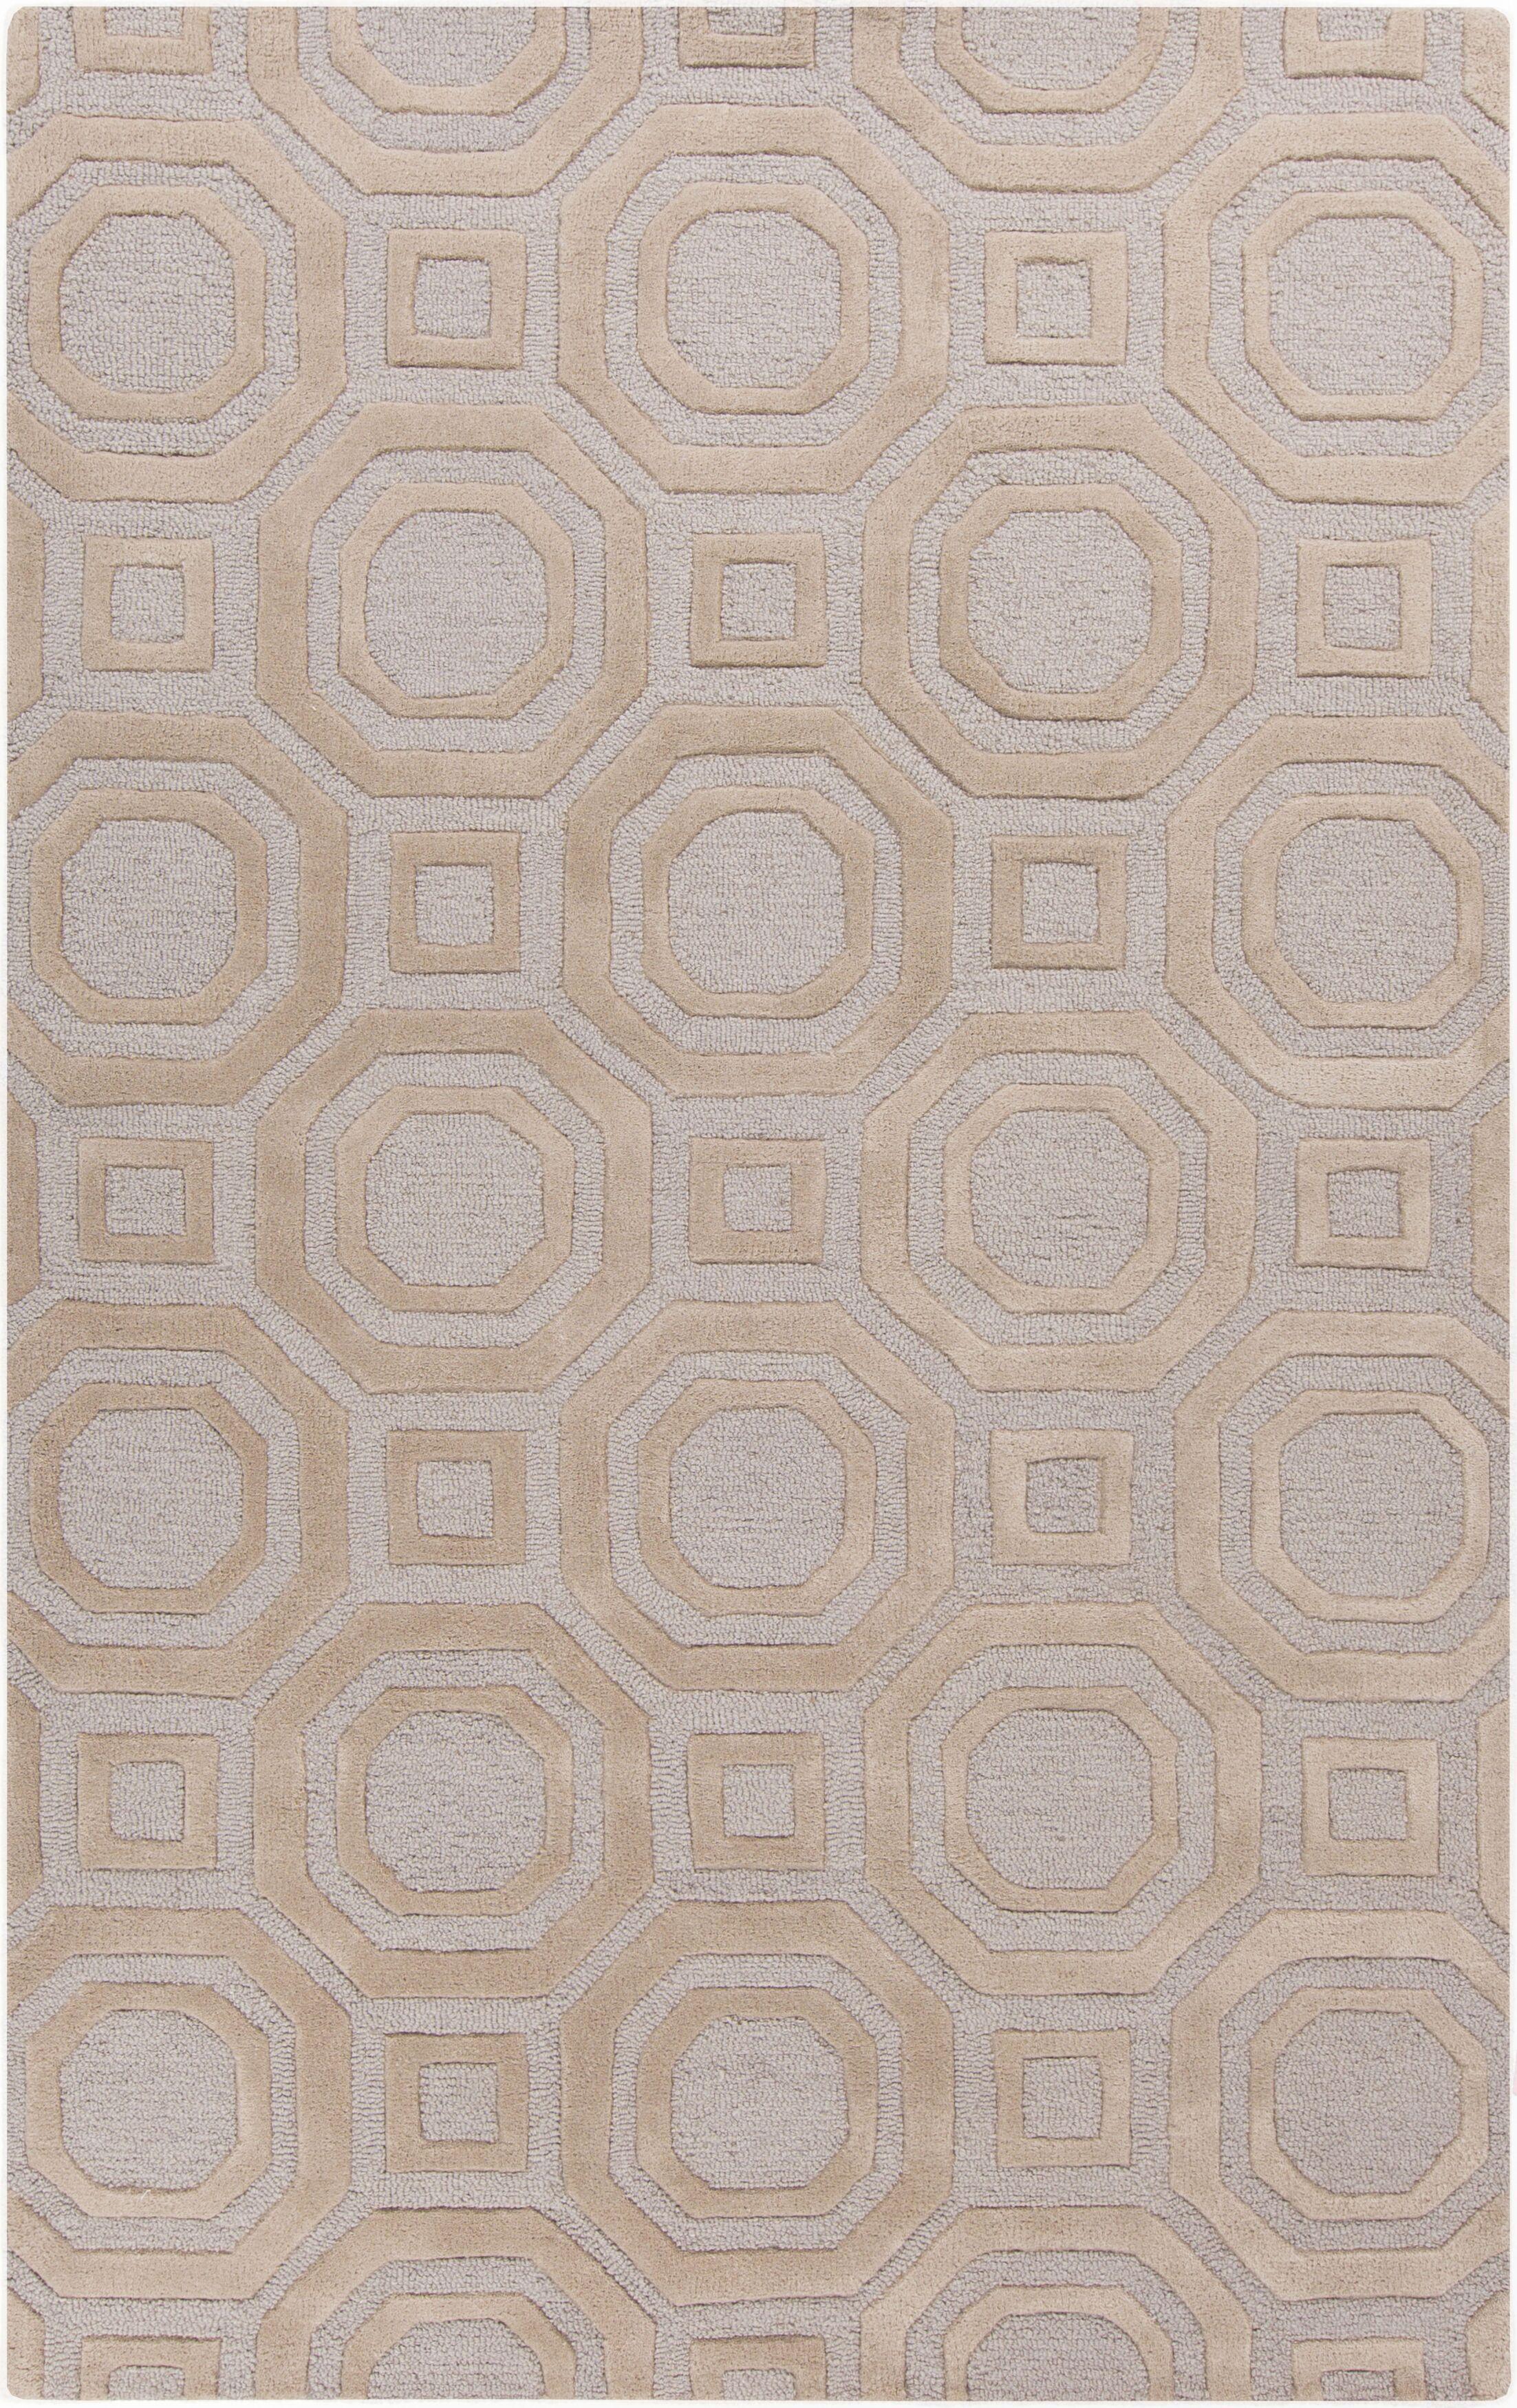 Sandi Hand-Tufted Beige Area Rug Rug Size: Rectangle 5' x 8'